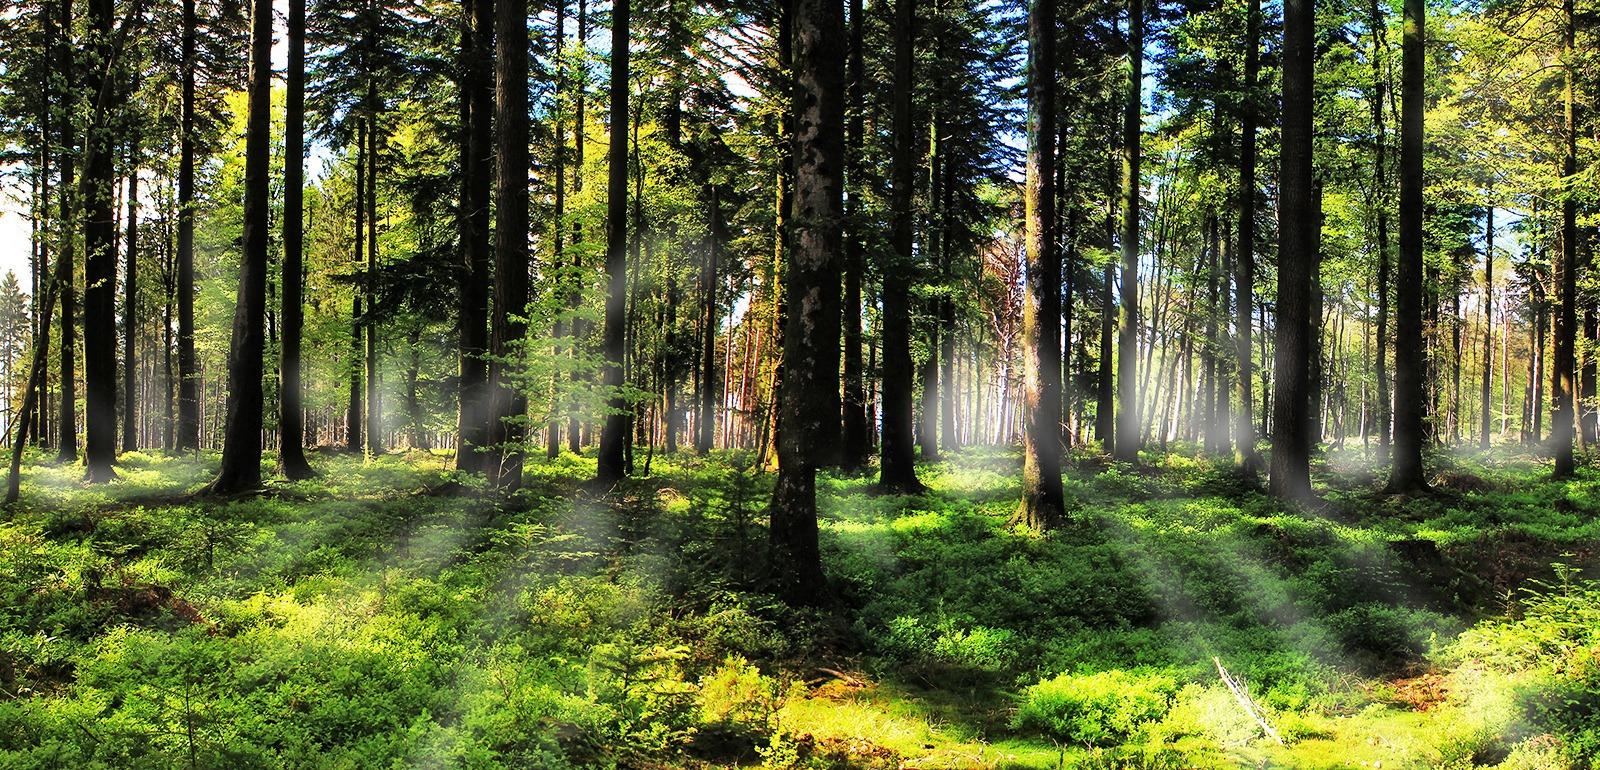 Forêt Orne © JE Rubio